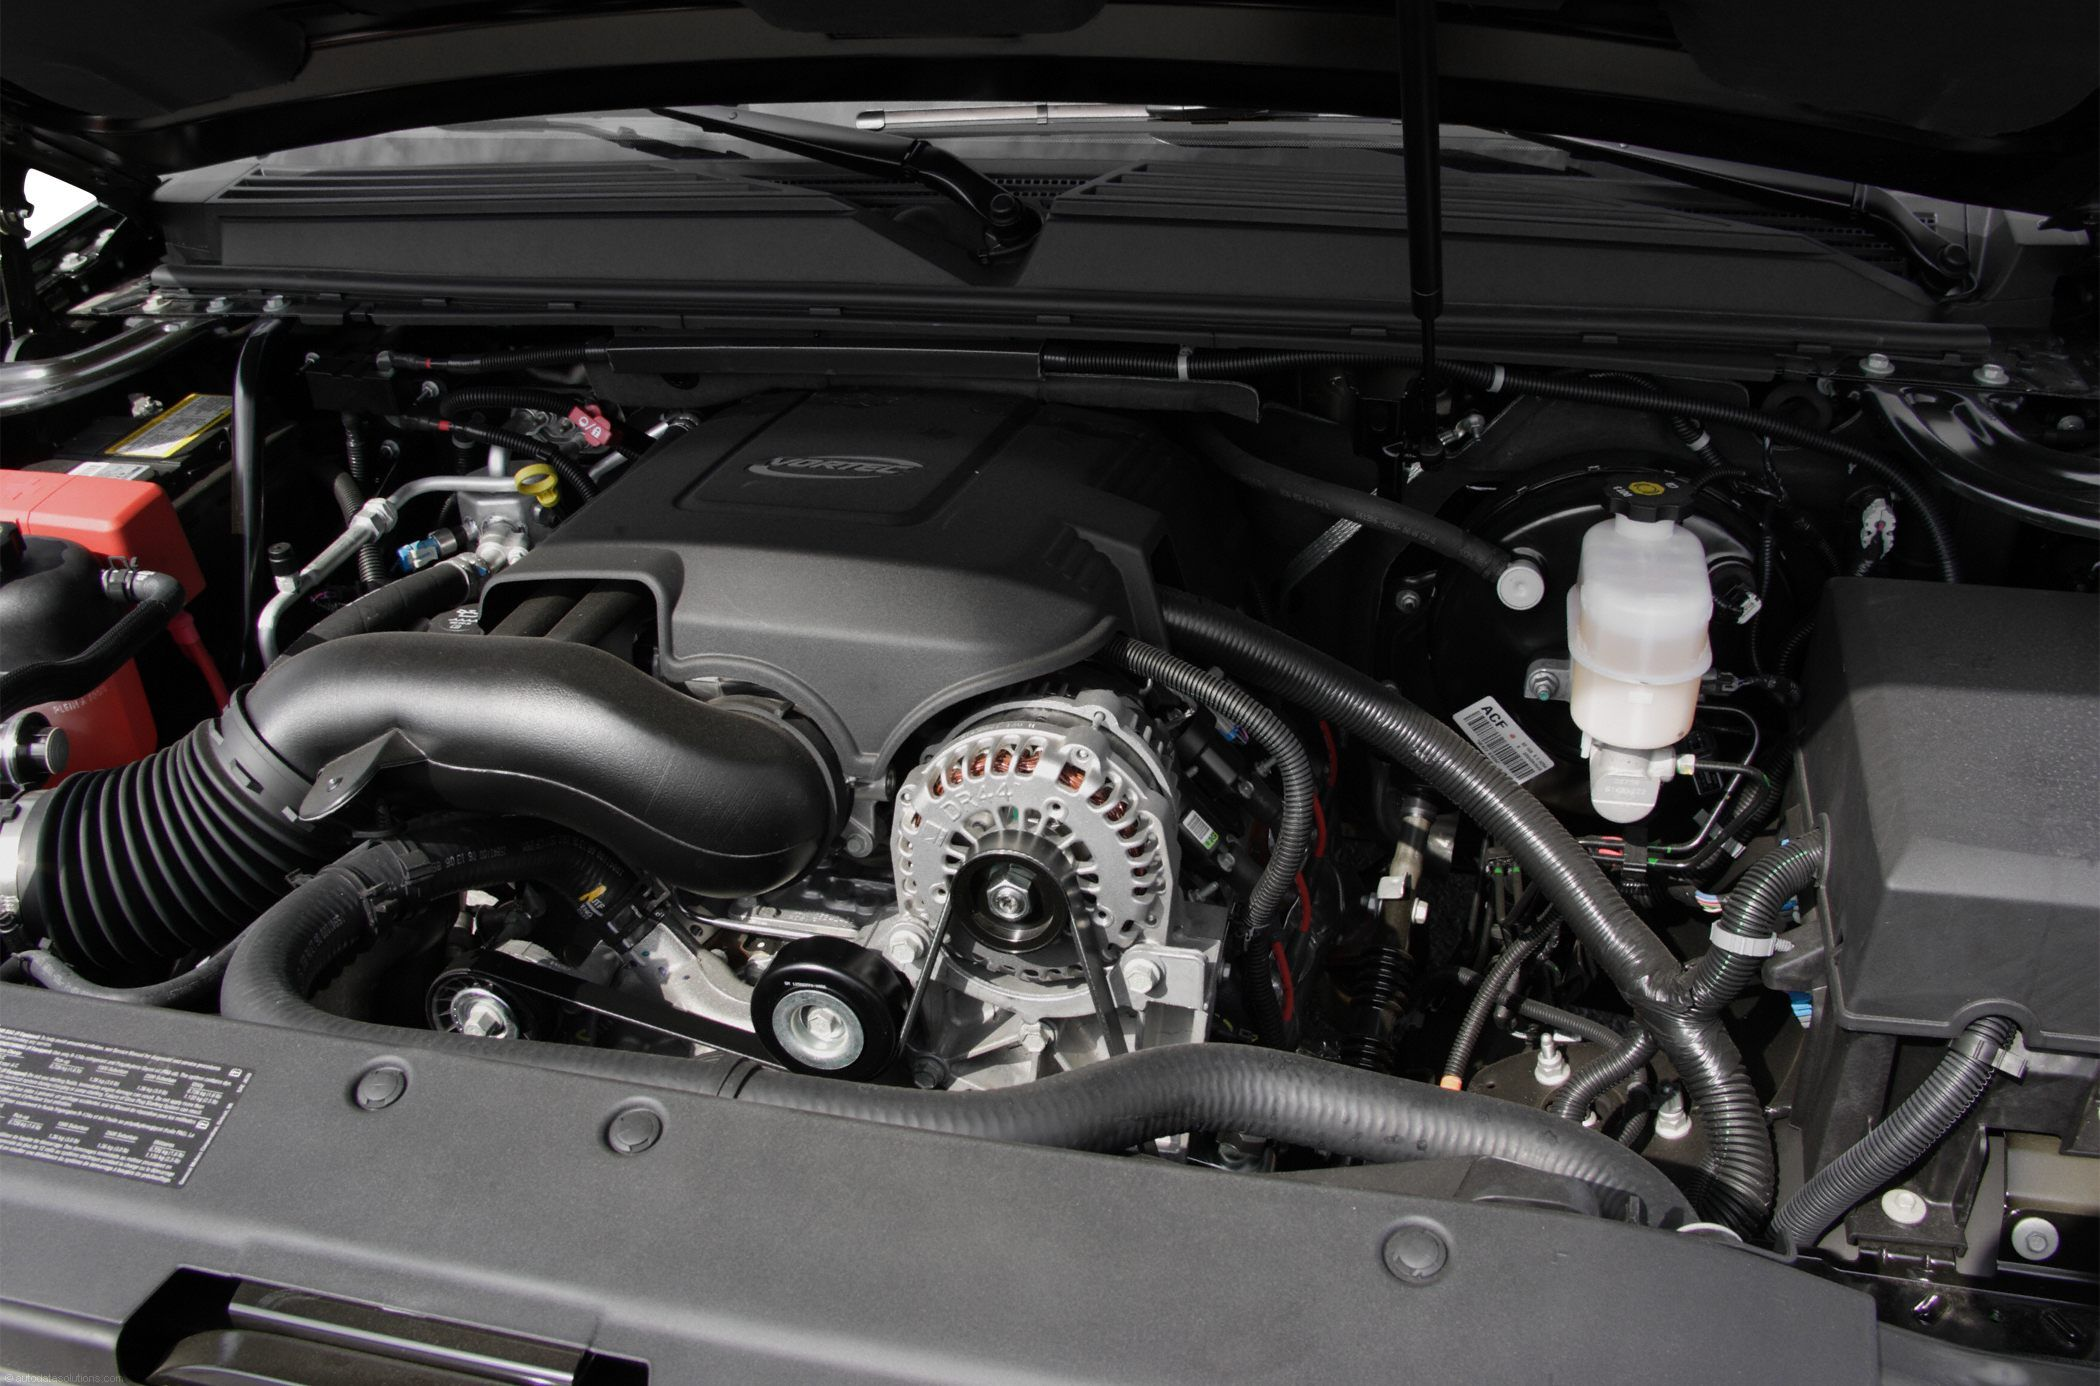 2010 gmc yukon xl 1500 usedengine description gas engine 5 3 4x4 utr fits 2010 gmc yukon xl 1500 5 3l vin 3 8th digit opt lc9 condition 73k miles